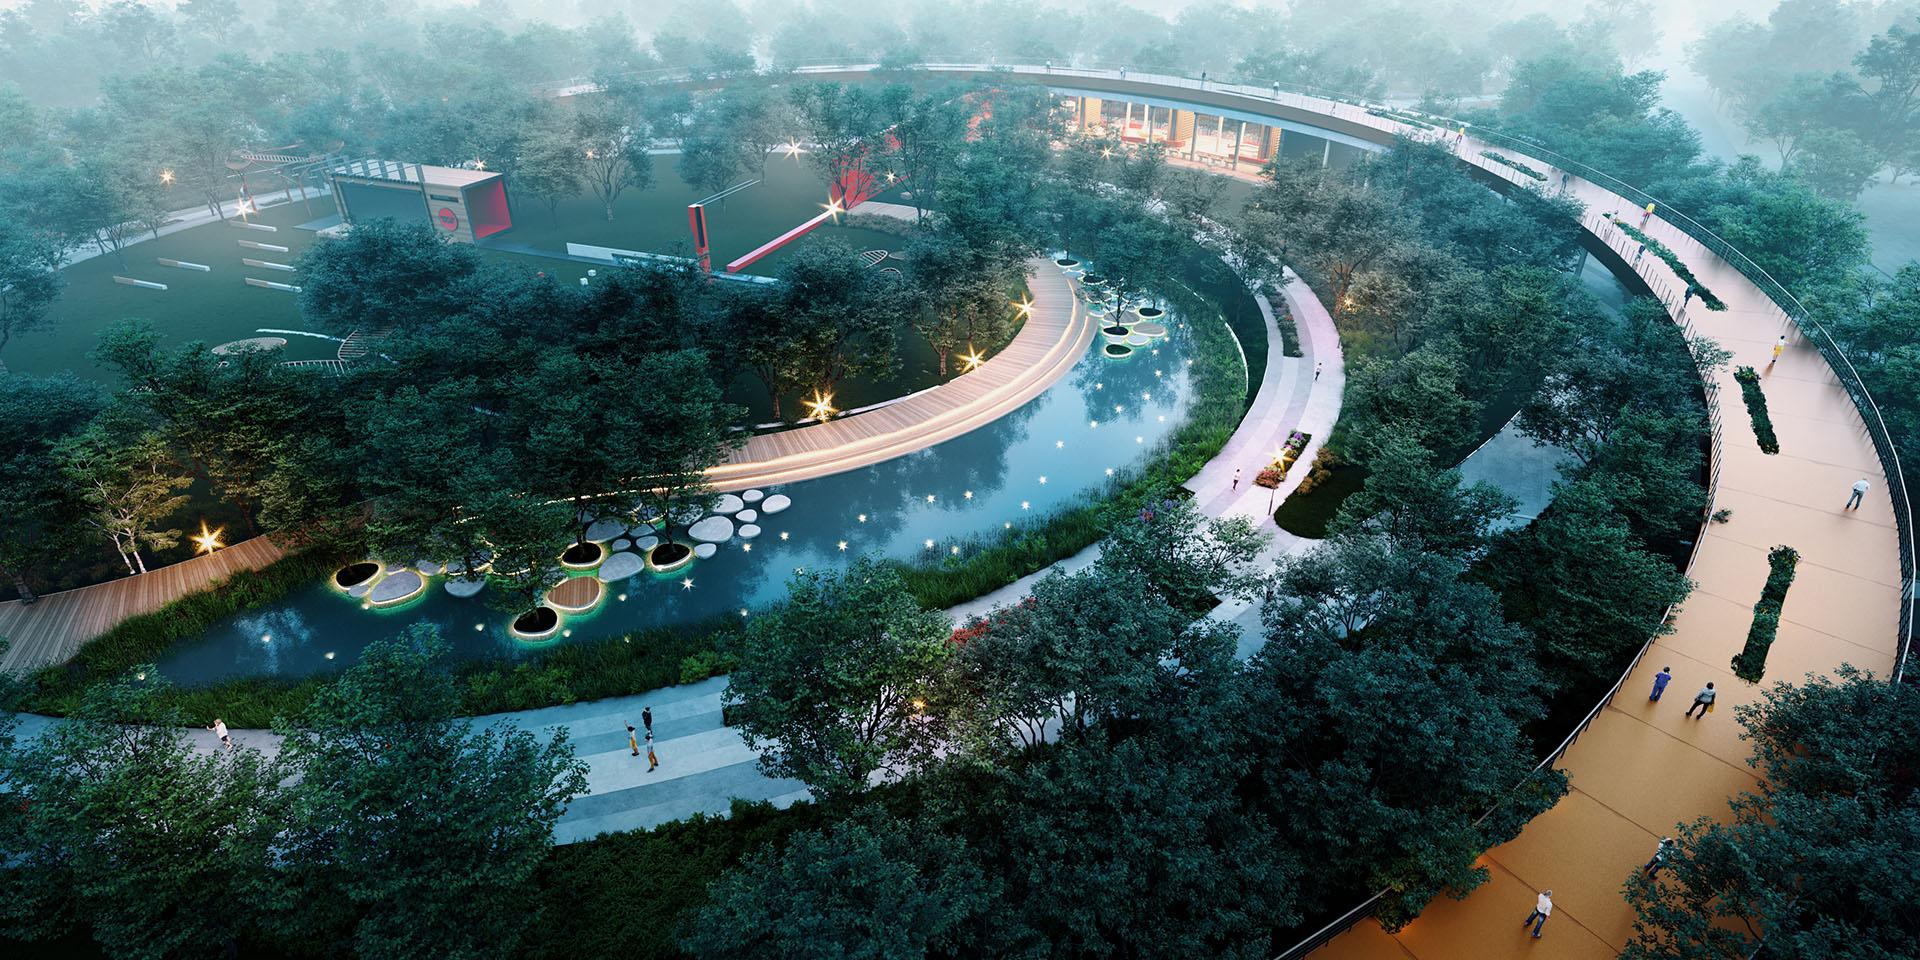 Eskisehir City Park